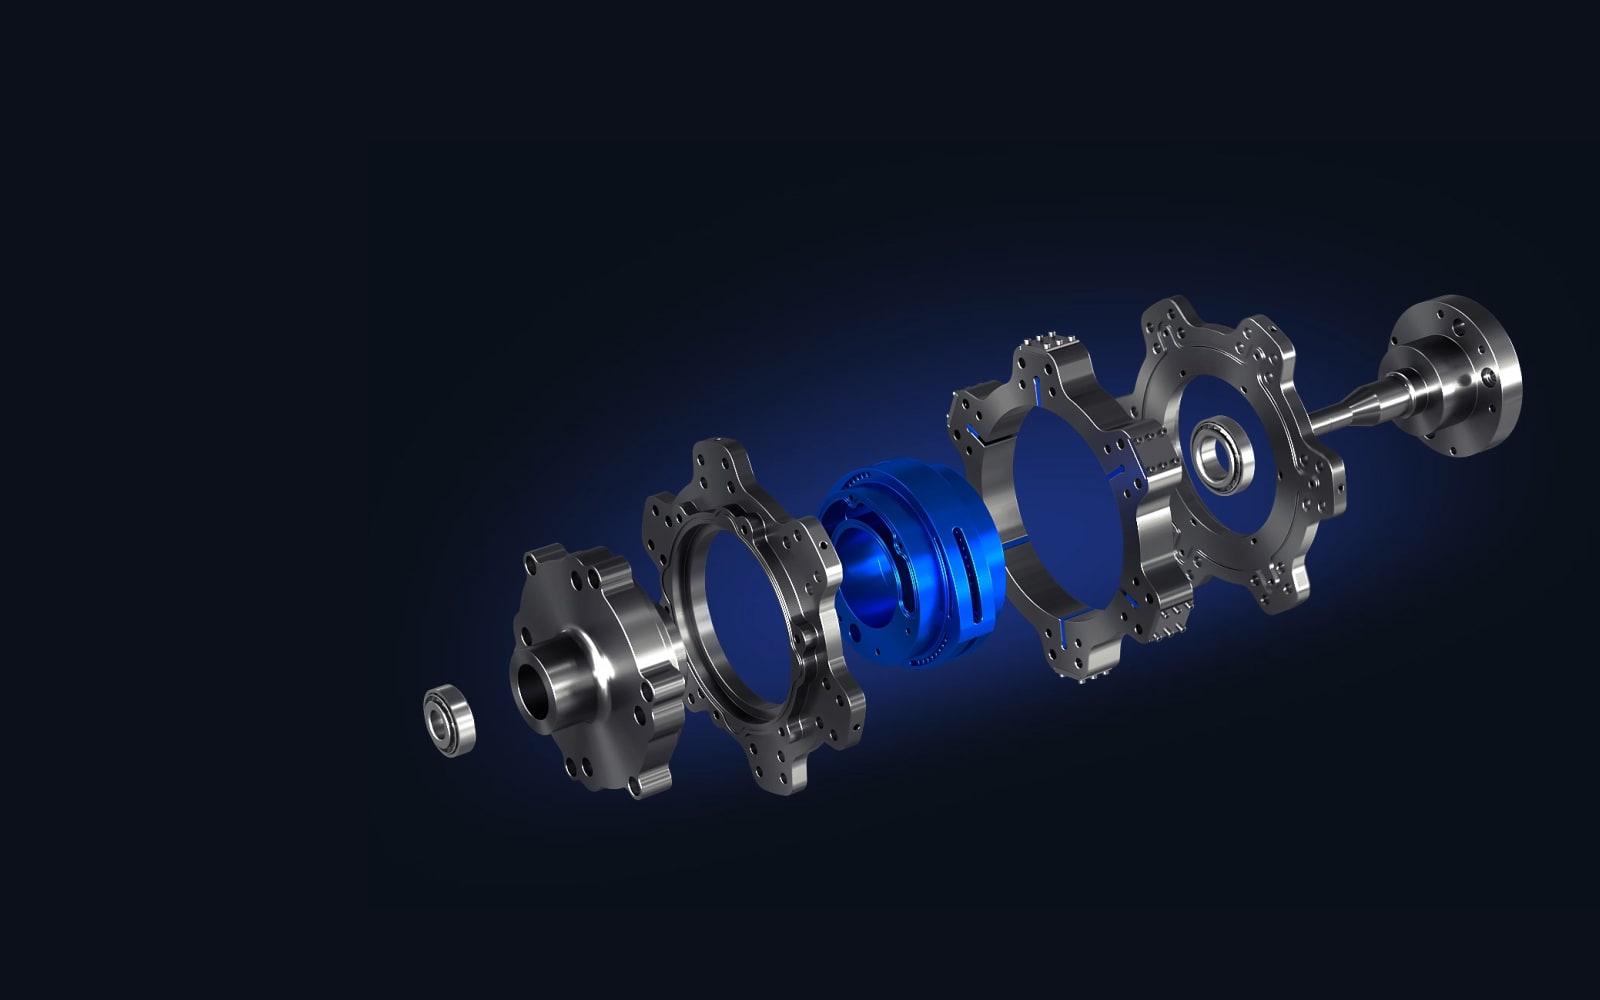 preload in wheel motor